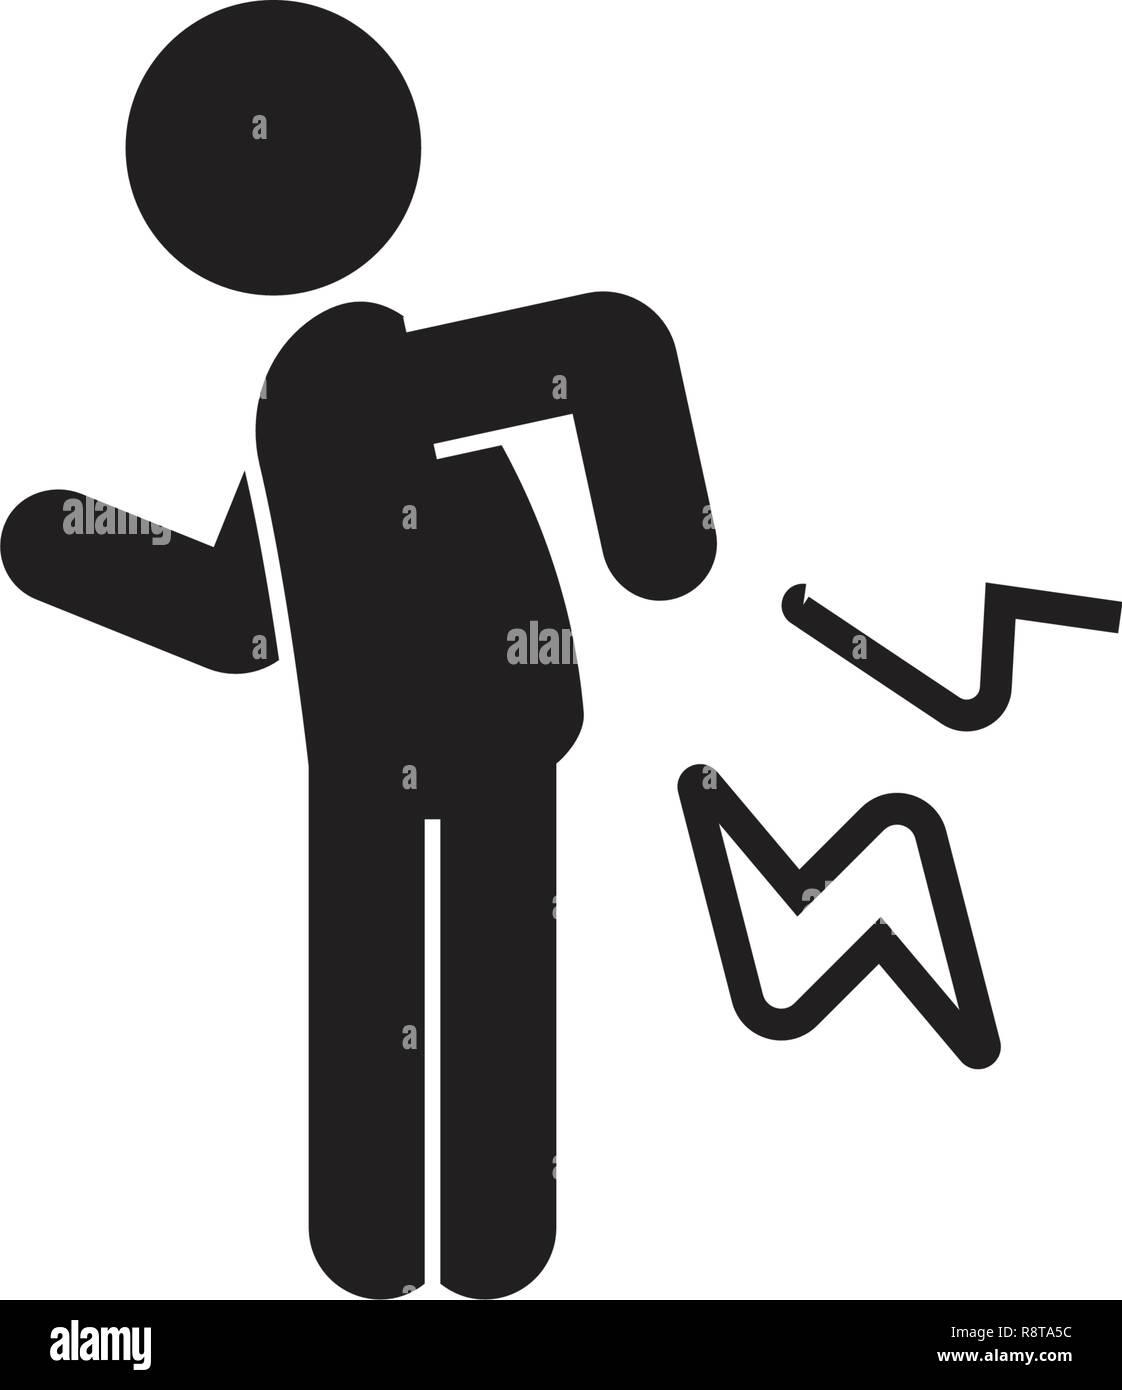 Rheumatoide Arthritis schwarz Vektor Konzept Symbol. Rheumatoide Arthritis flachbild Illustration, Zeichen Stockbild